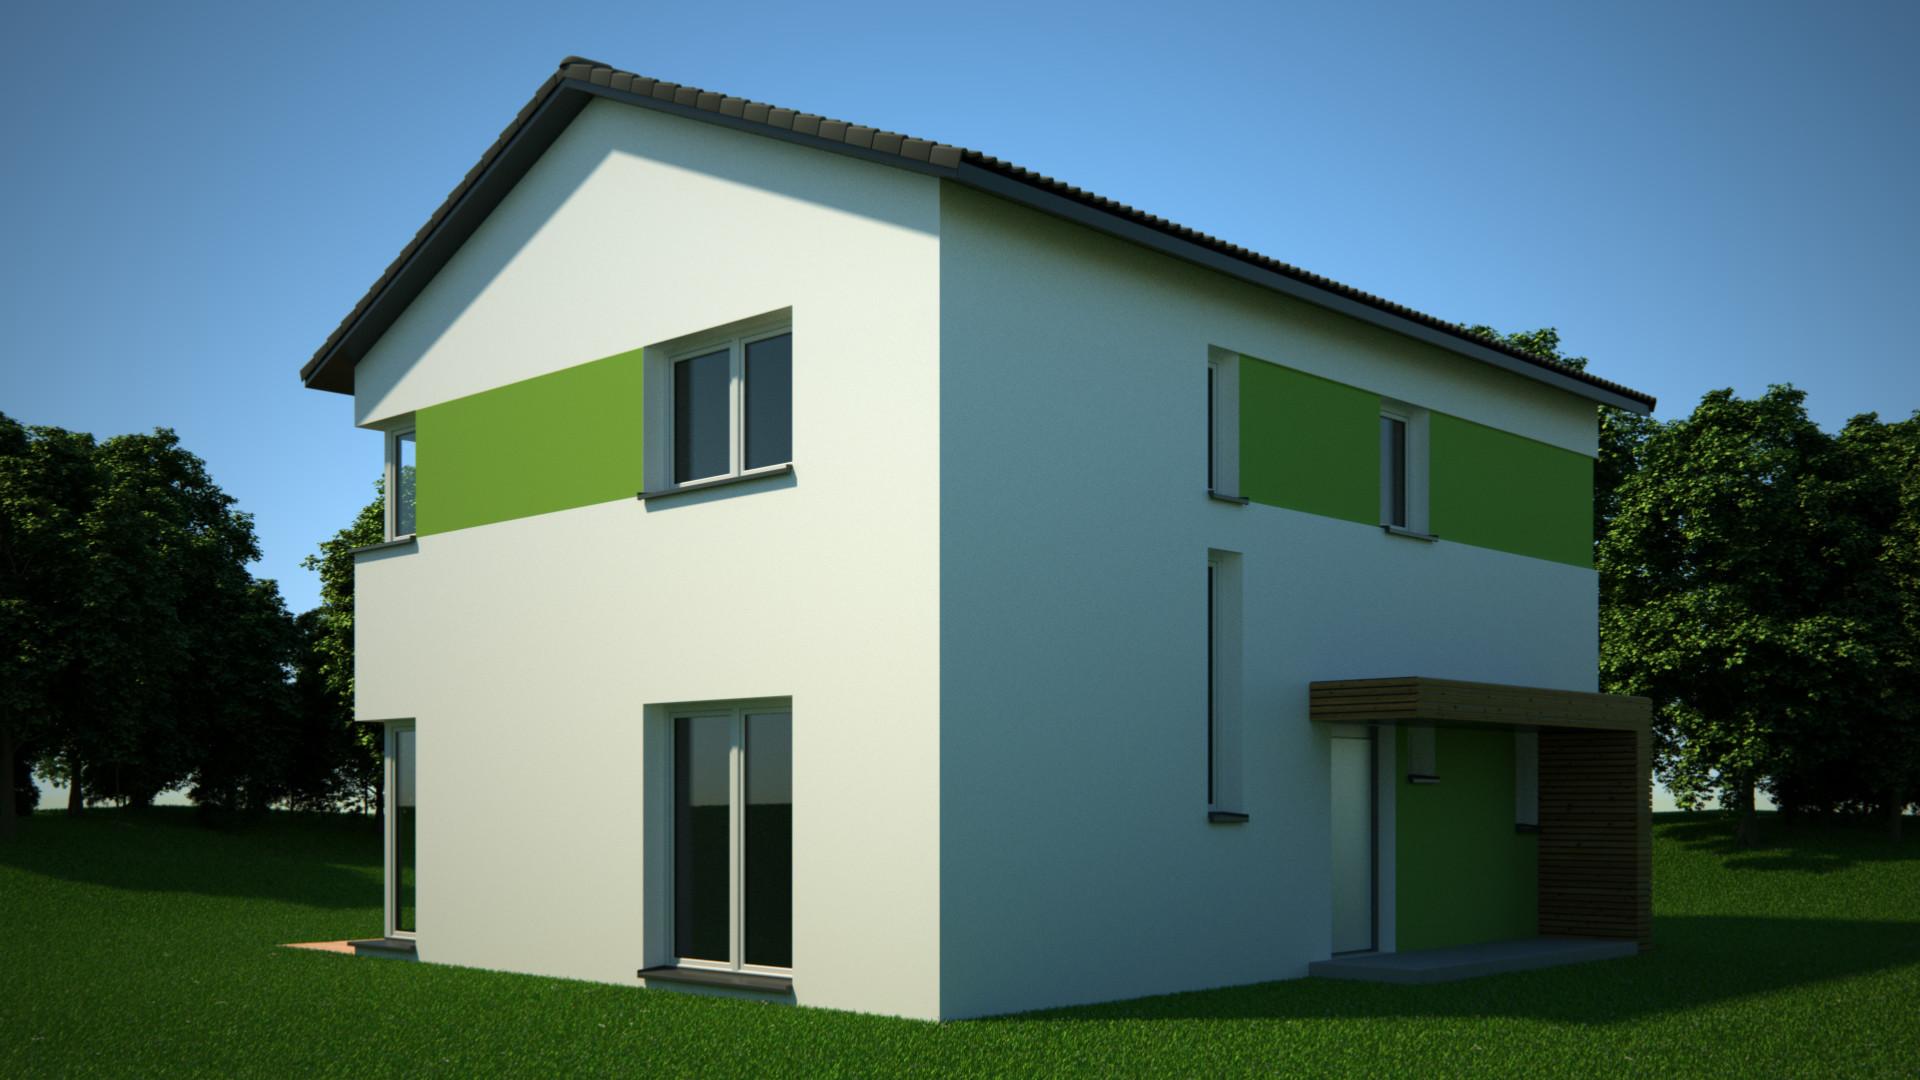 Reinhard kepplinger 130a cam2 terrasse dach iso 500 ohne vign refl trees stucco 94 newgrass 11 30 treeseed2212 tw